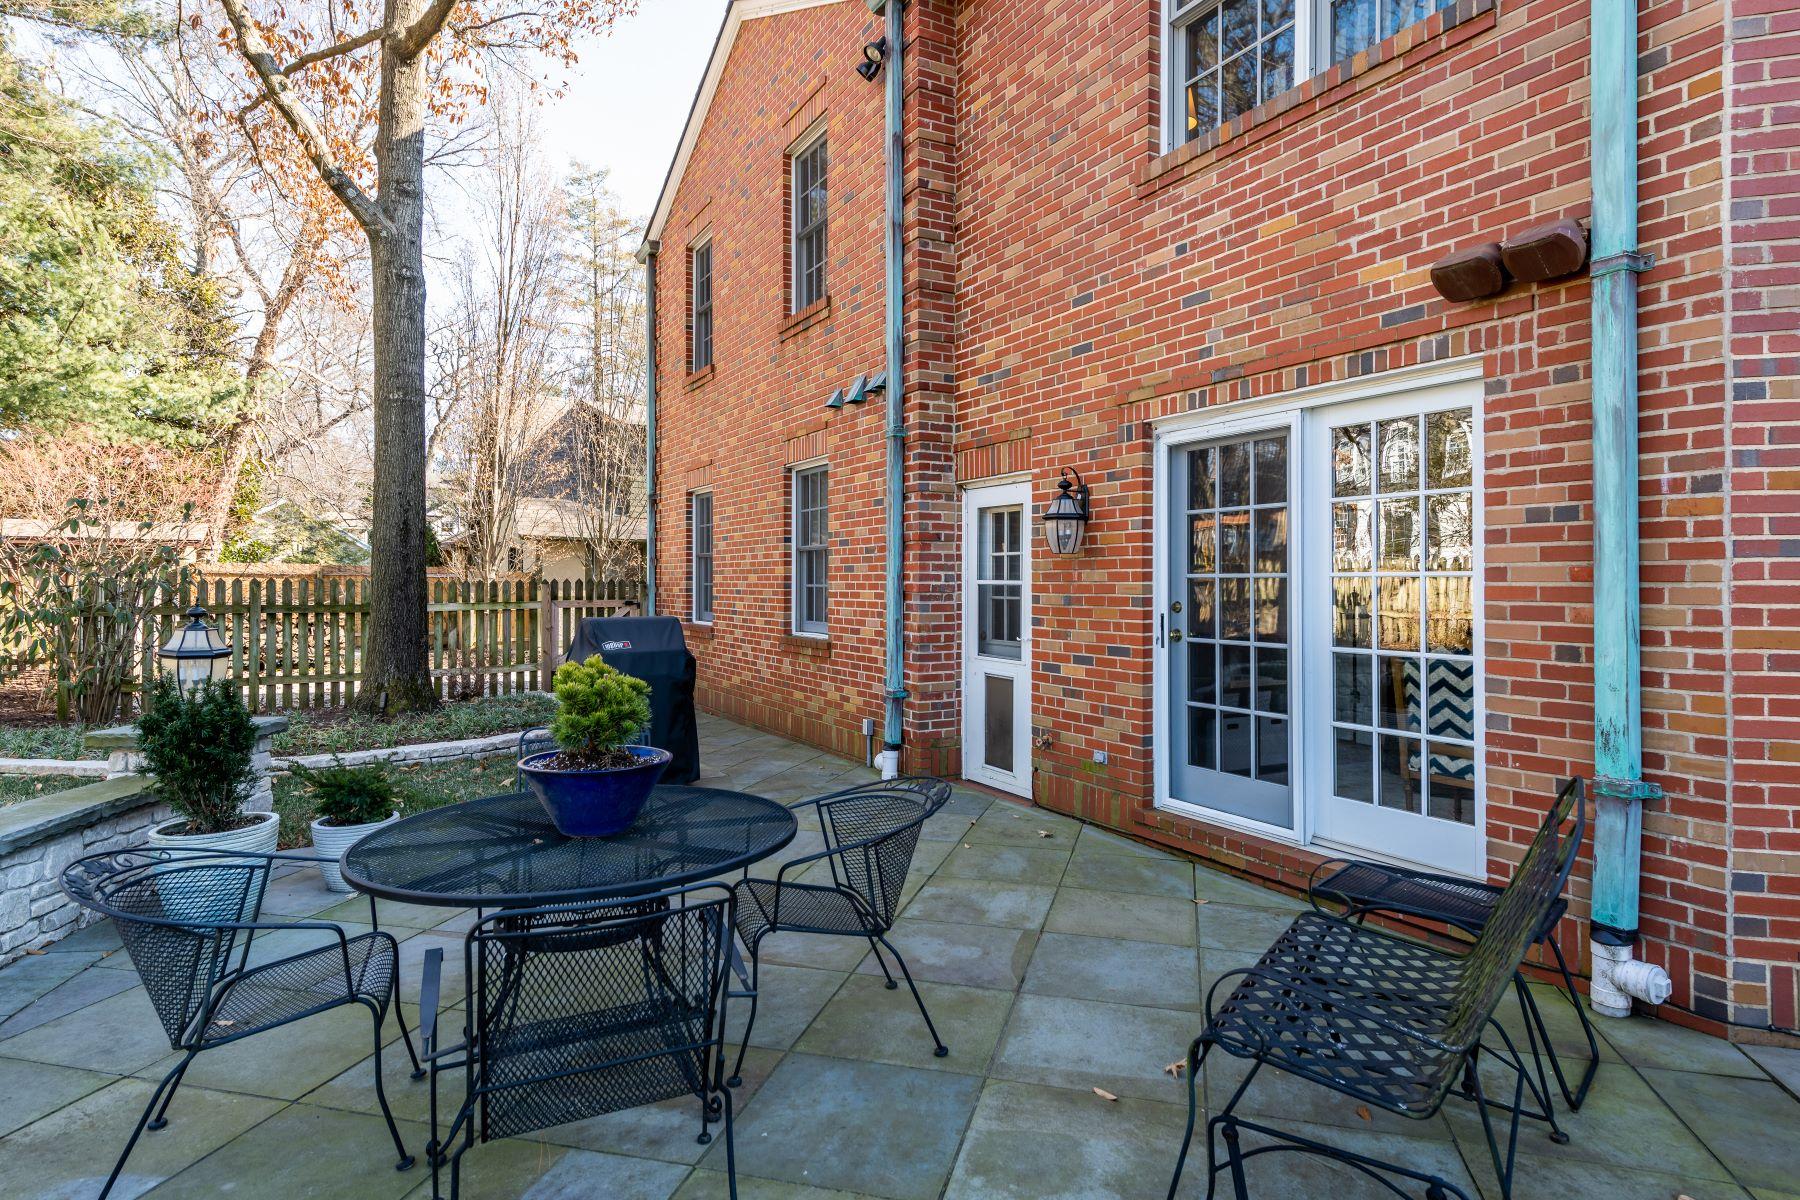 Additional photo for property listing at Stately Kirkwood Home 639 Scott Avenue Kirkwood, Missouri 63122 United States